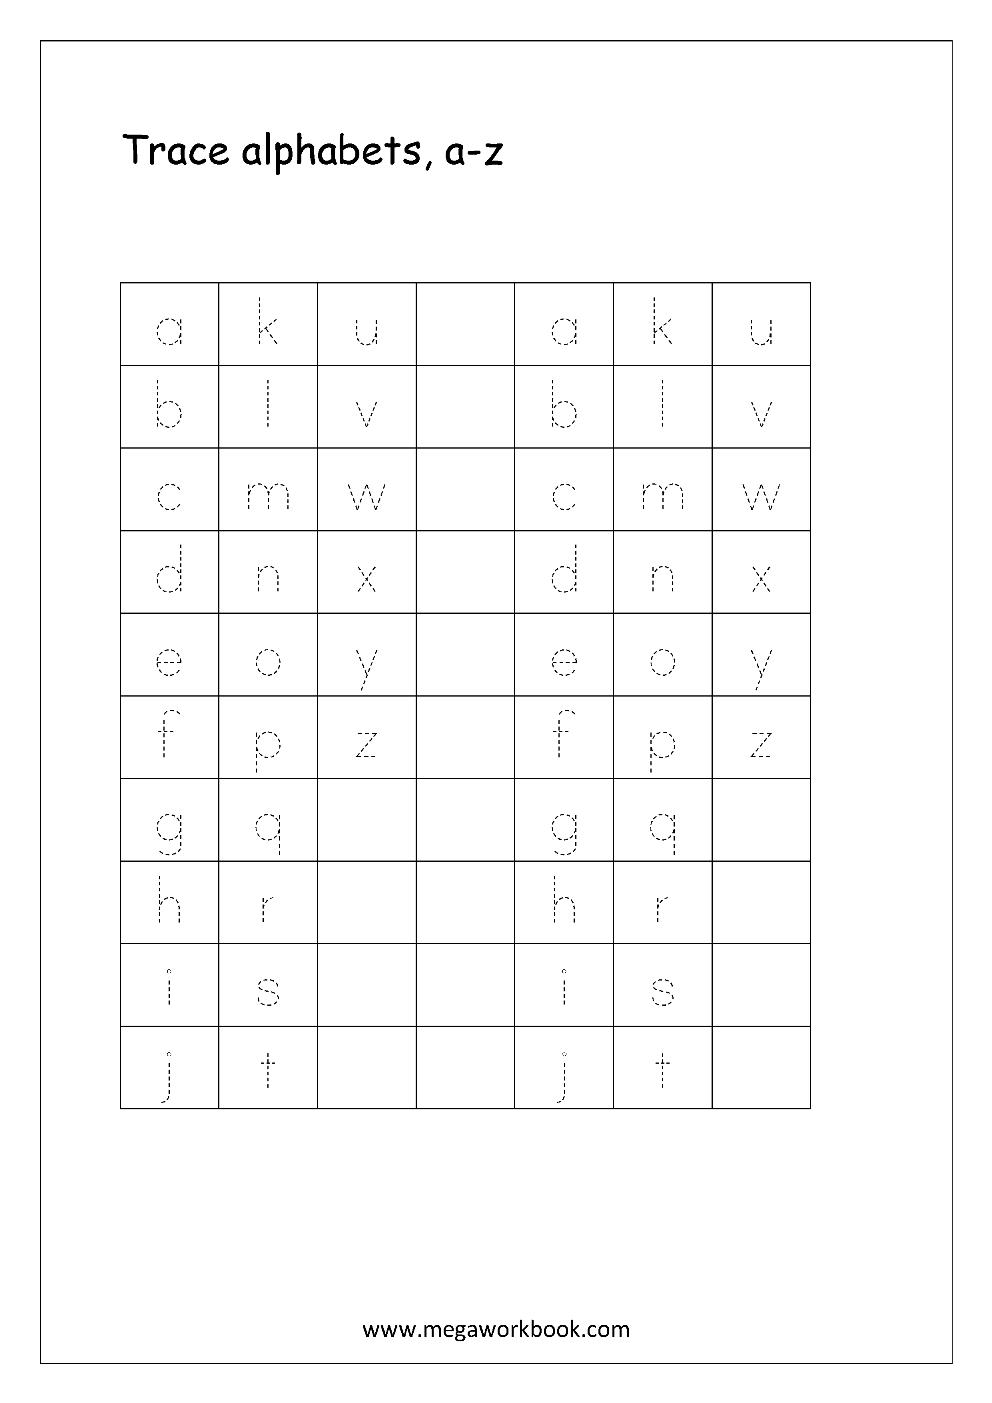 Free English Worksheets - Alphabet Tracing (Small Letters) - Letter - Free Printable Alphabet Tracing Worksheets